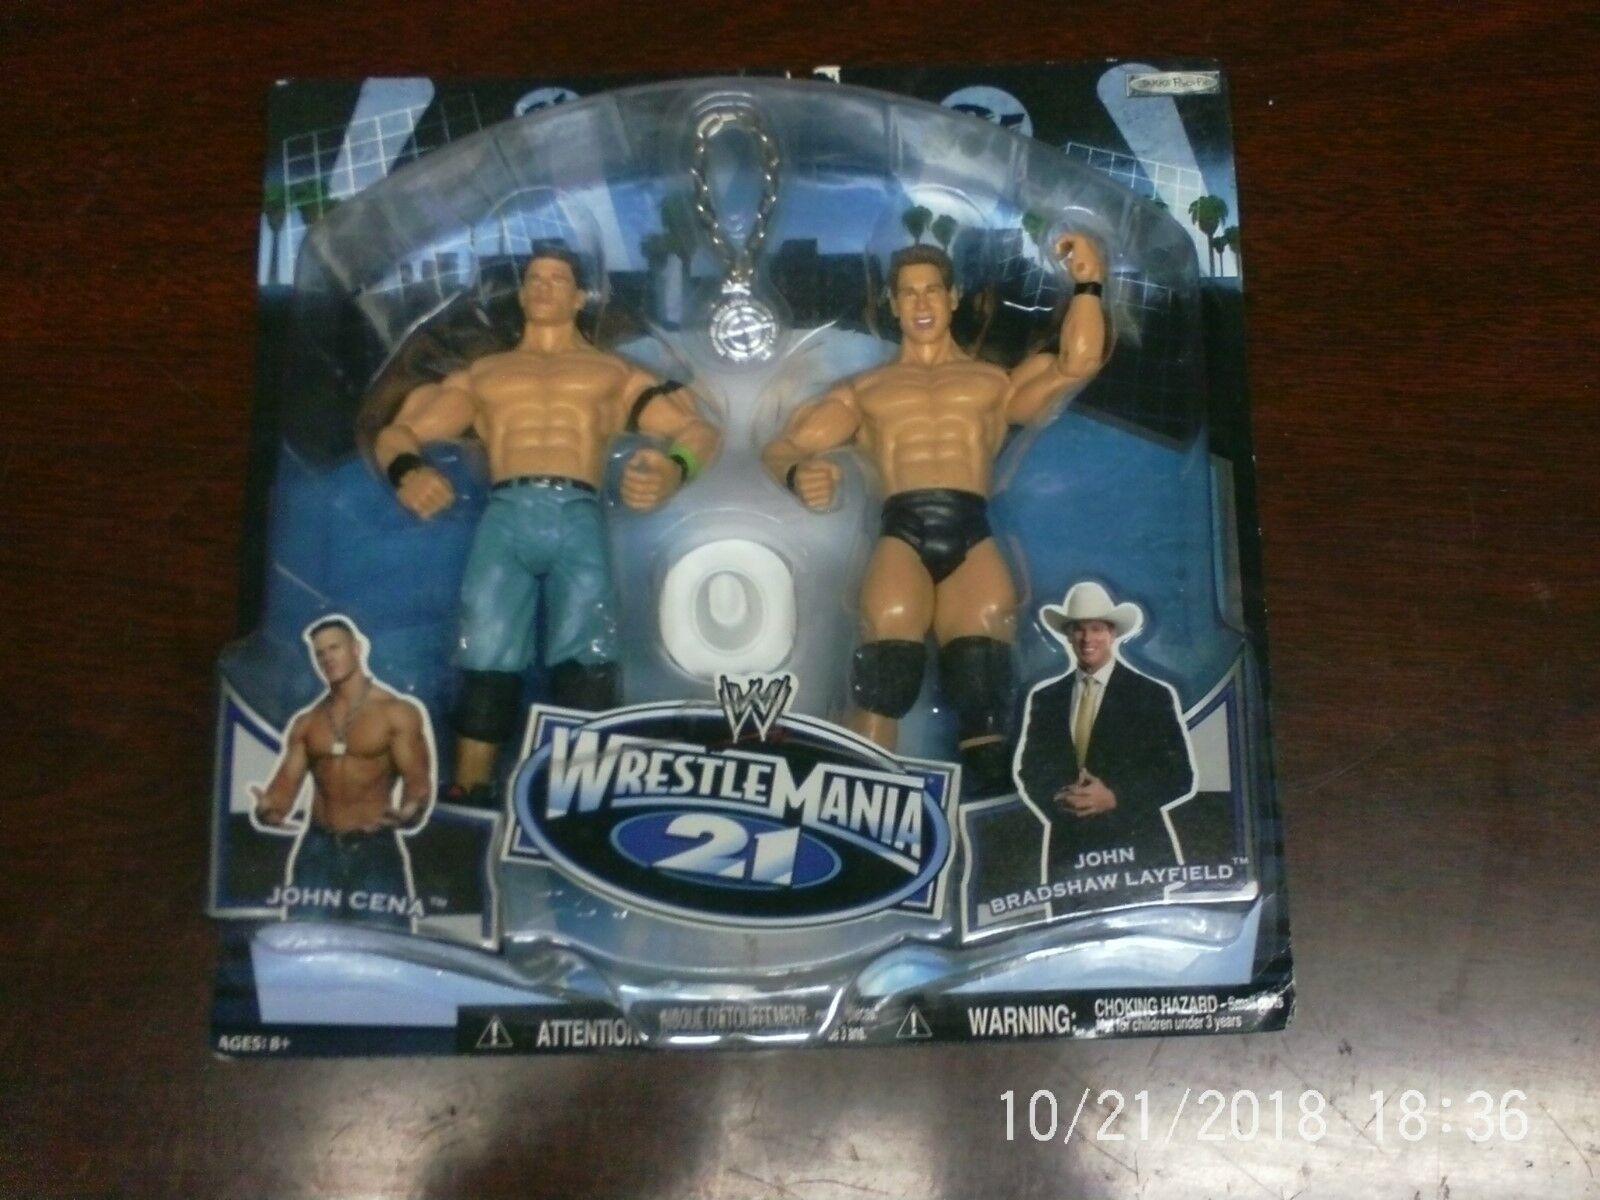 WWE Wrestle Mania 21 - John Cena - John Bradshaw Layfield